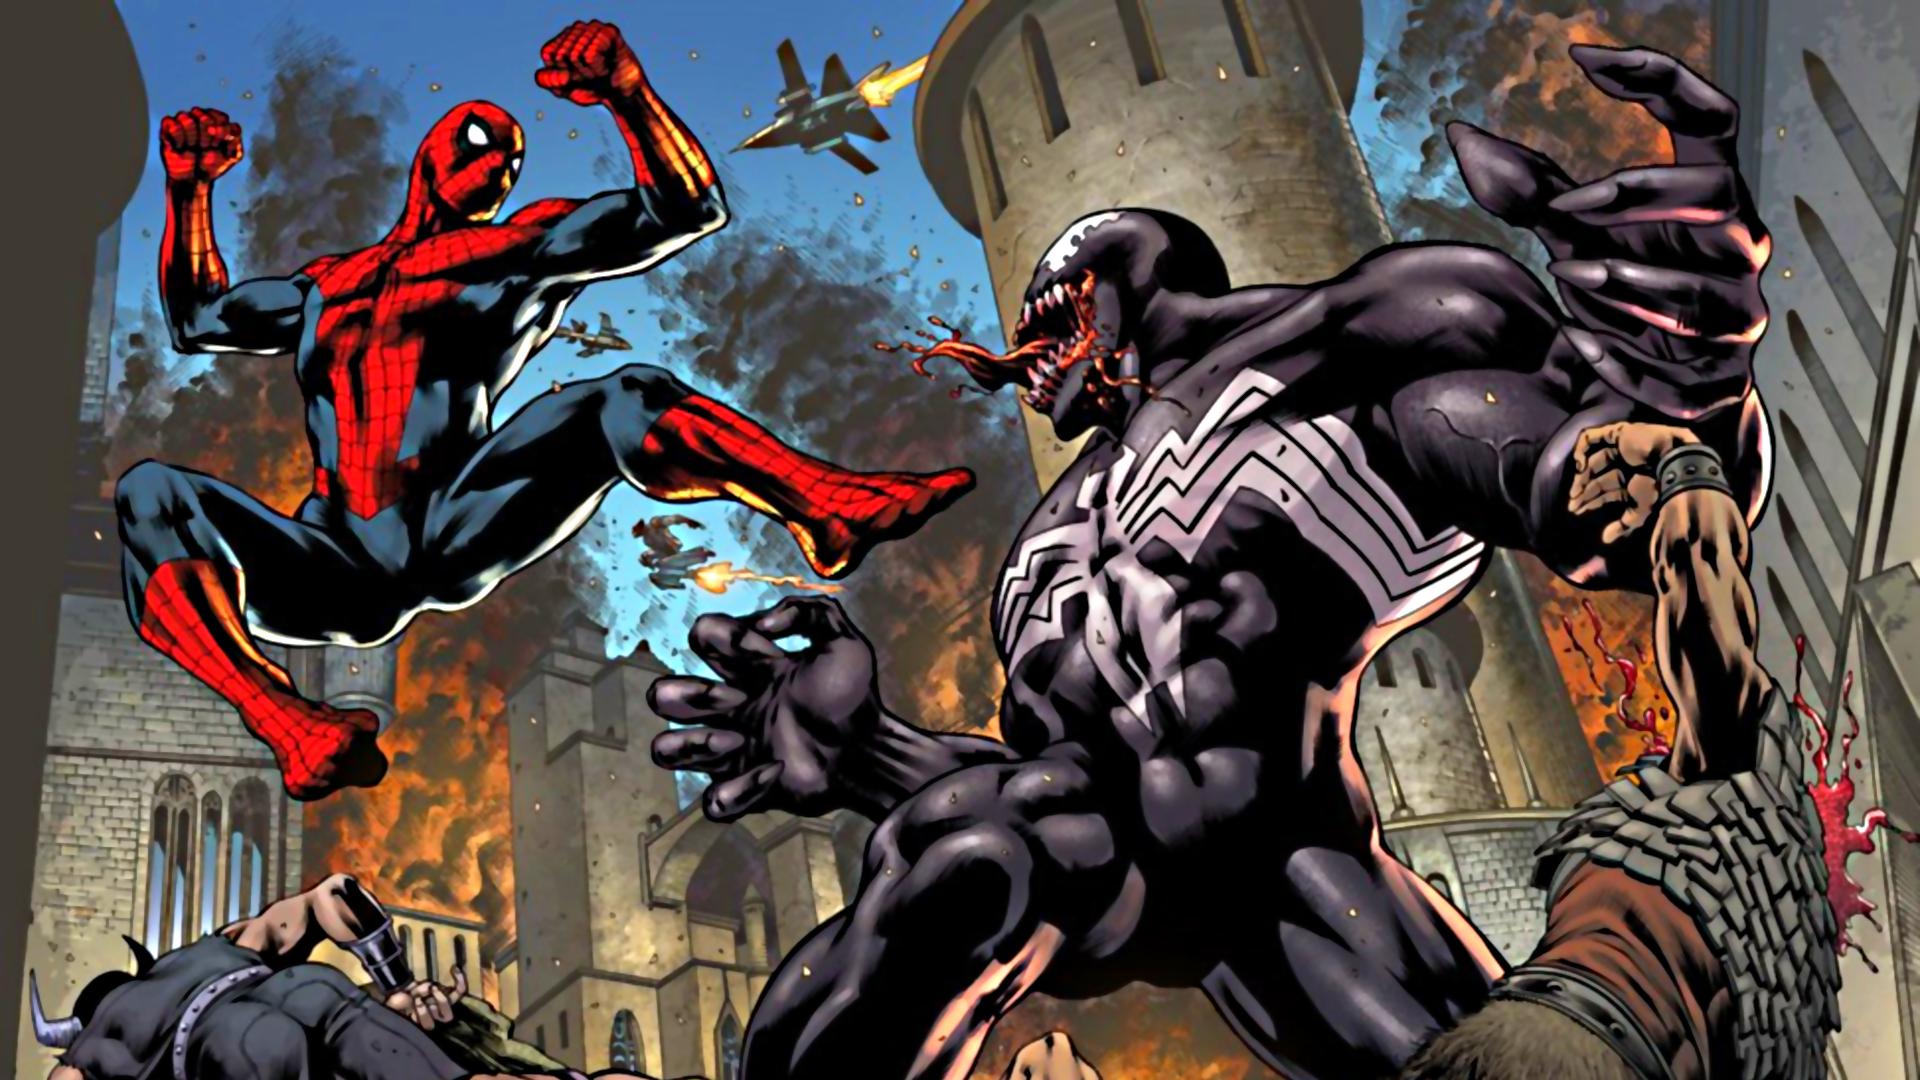 Coloriage spiderman contre venom imprimer et colorier - Coloriage spiderman et venom ...